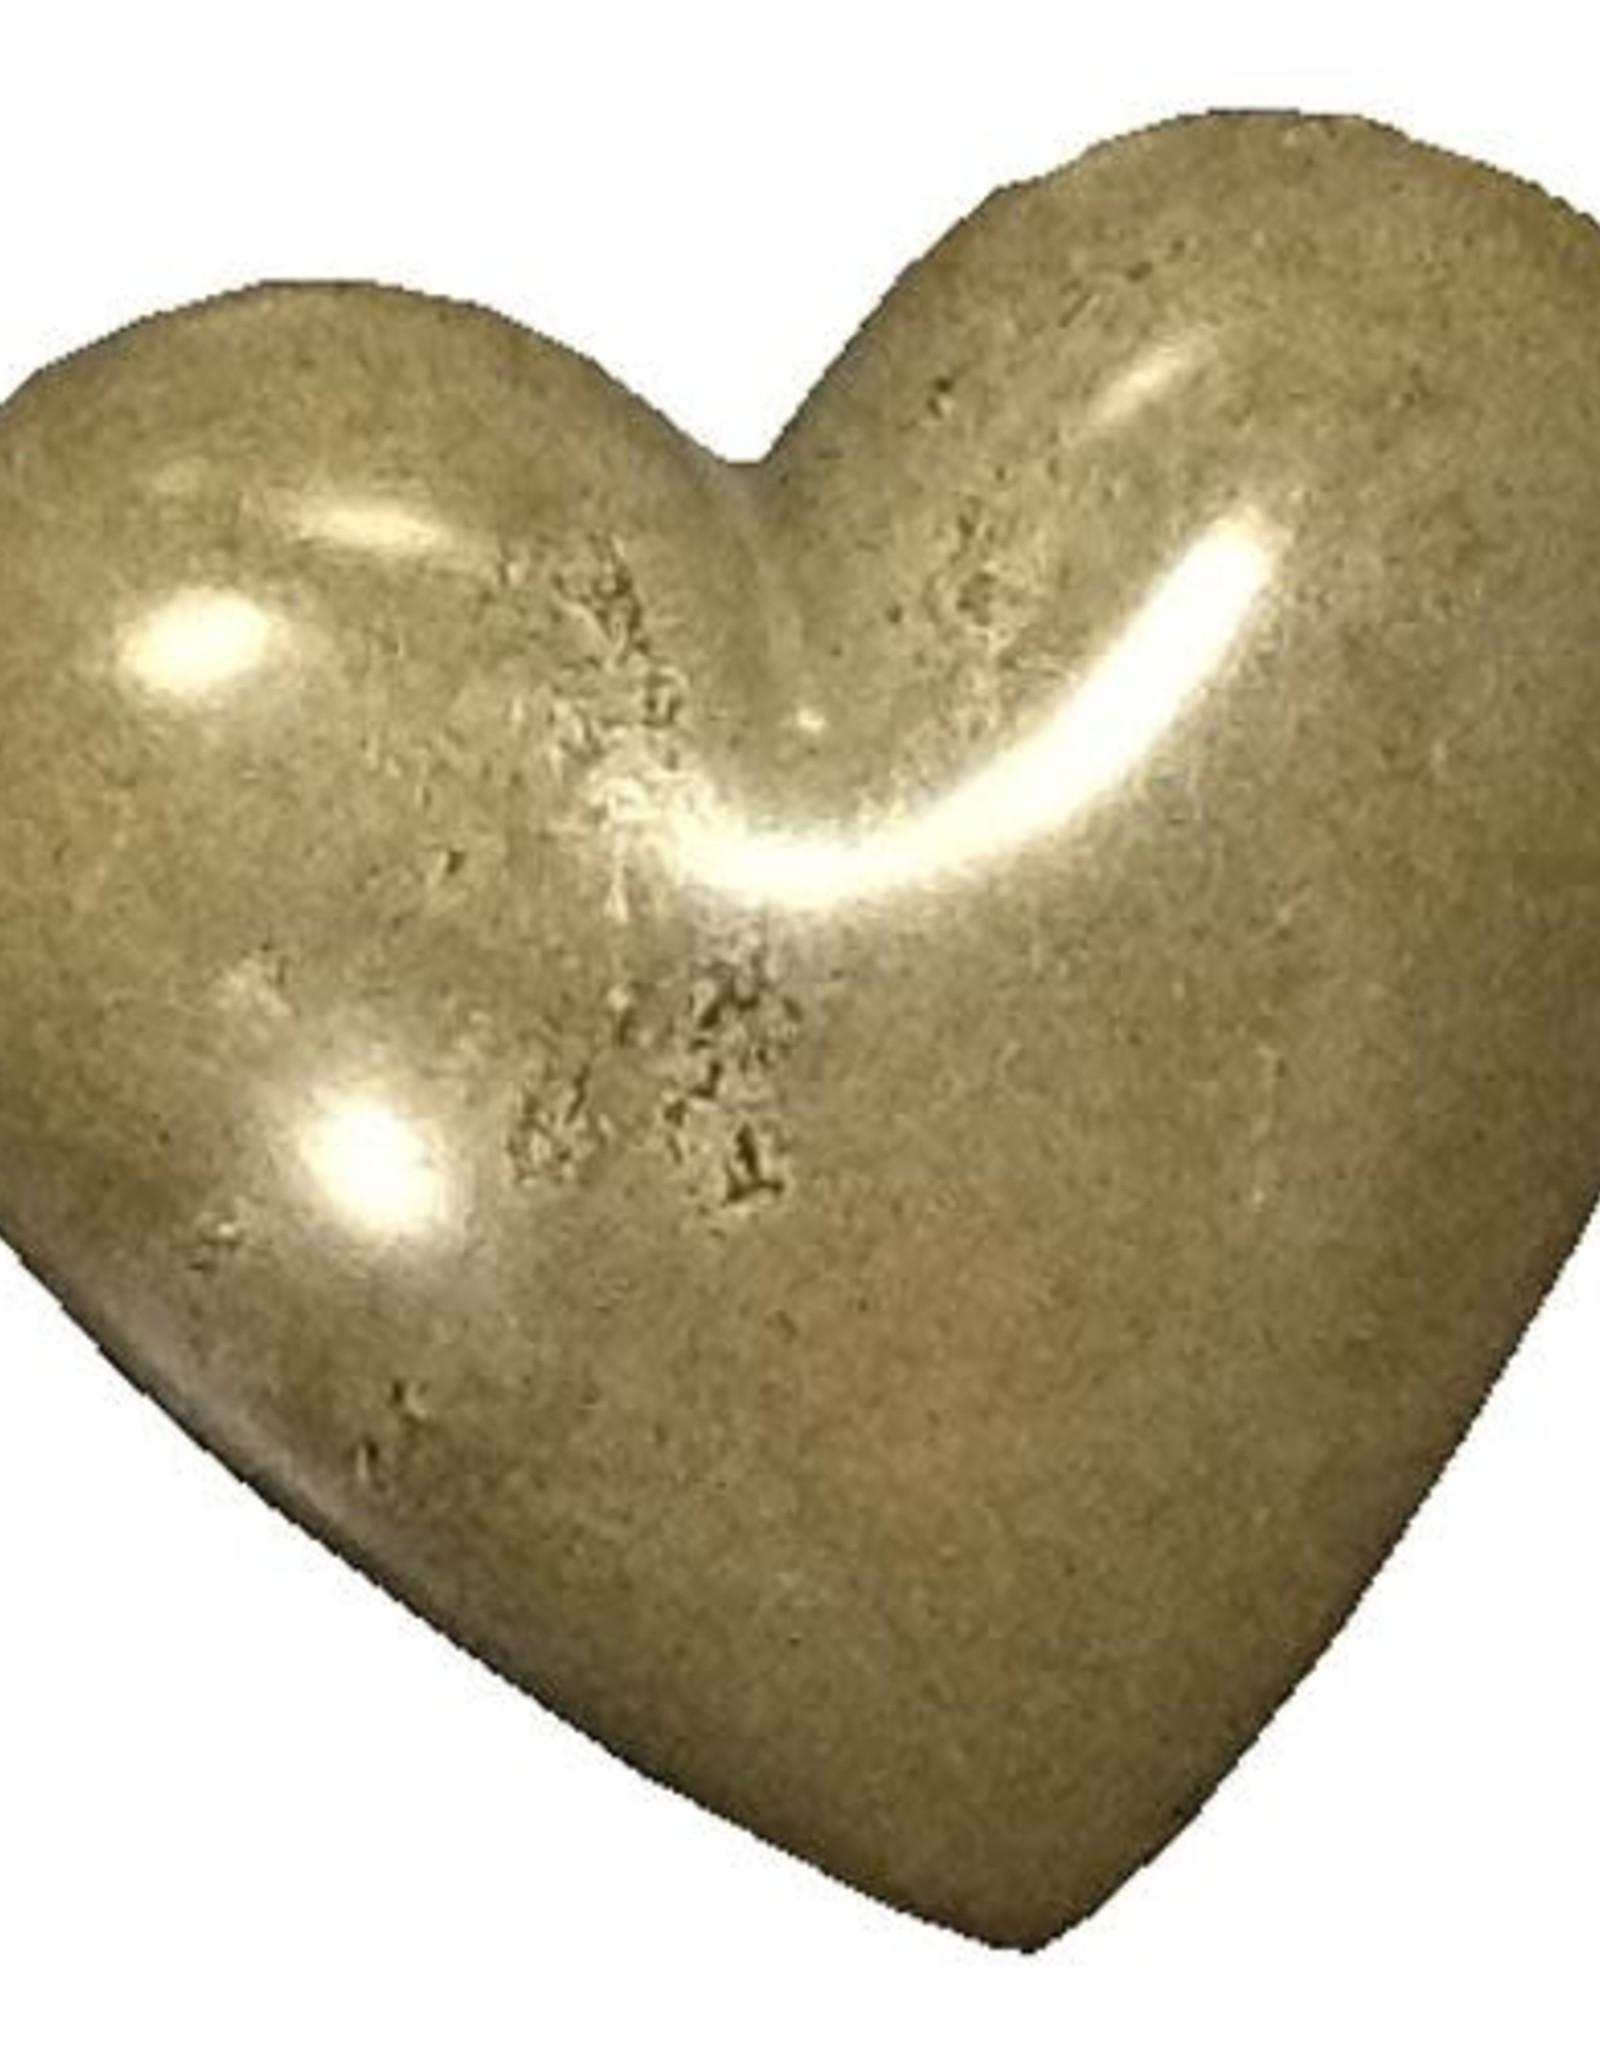 Soapstone Hearts Solid Gray